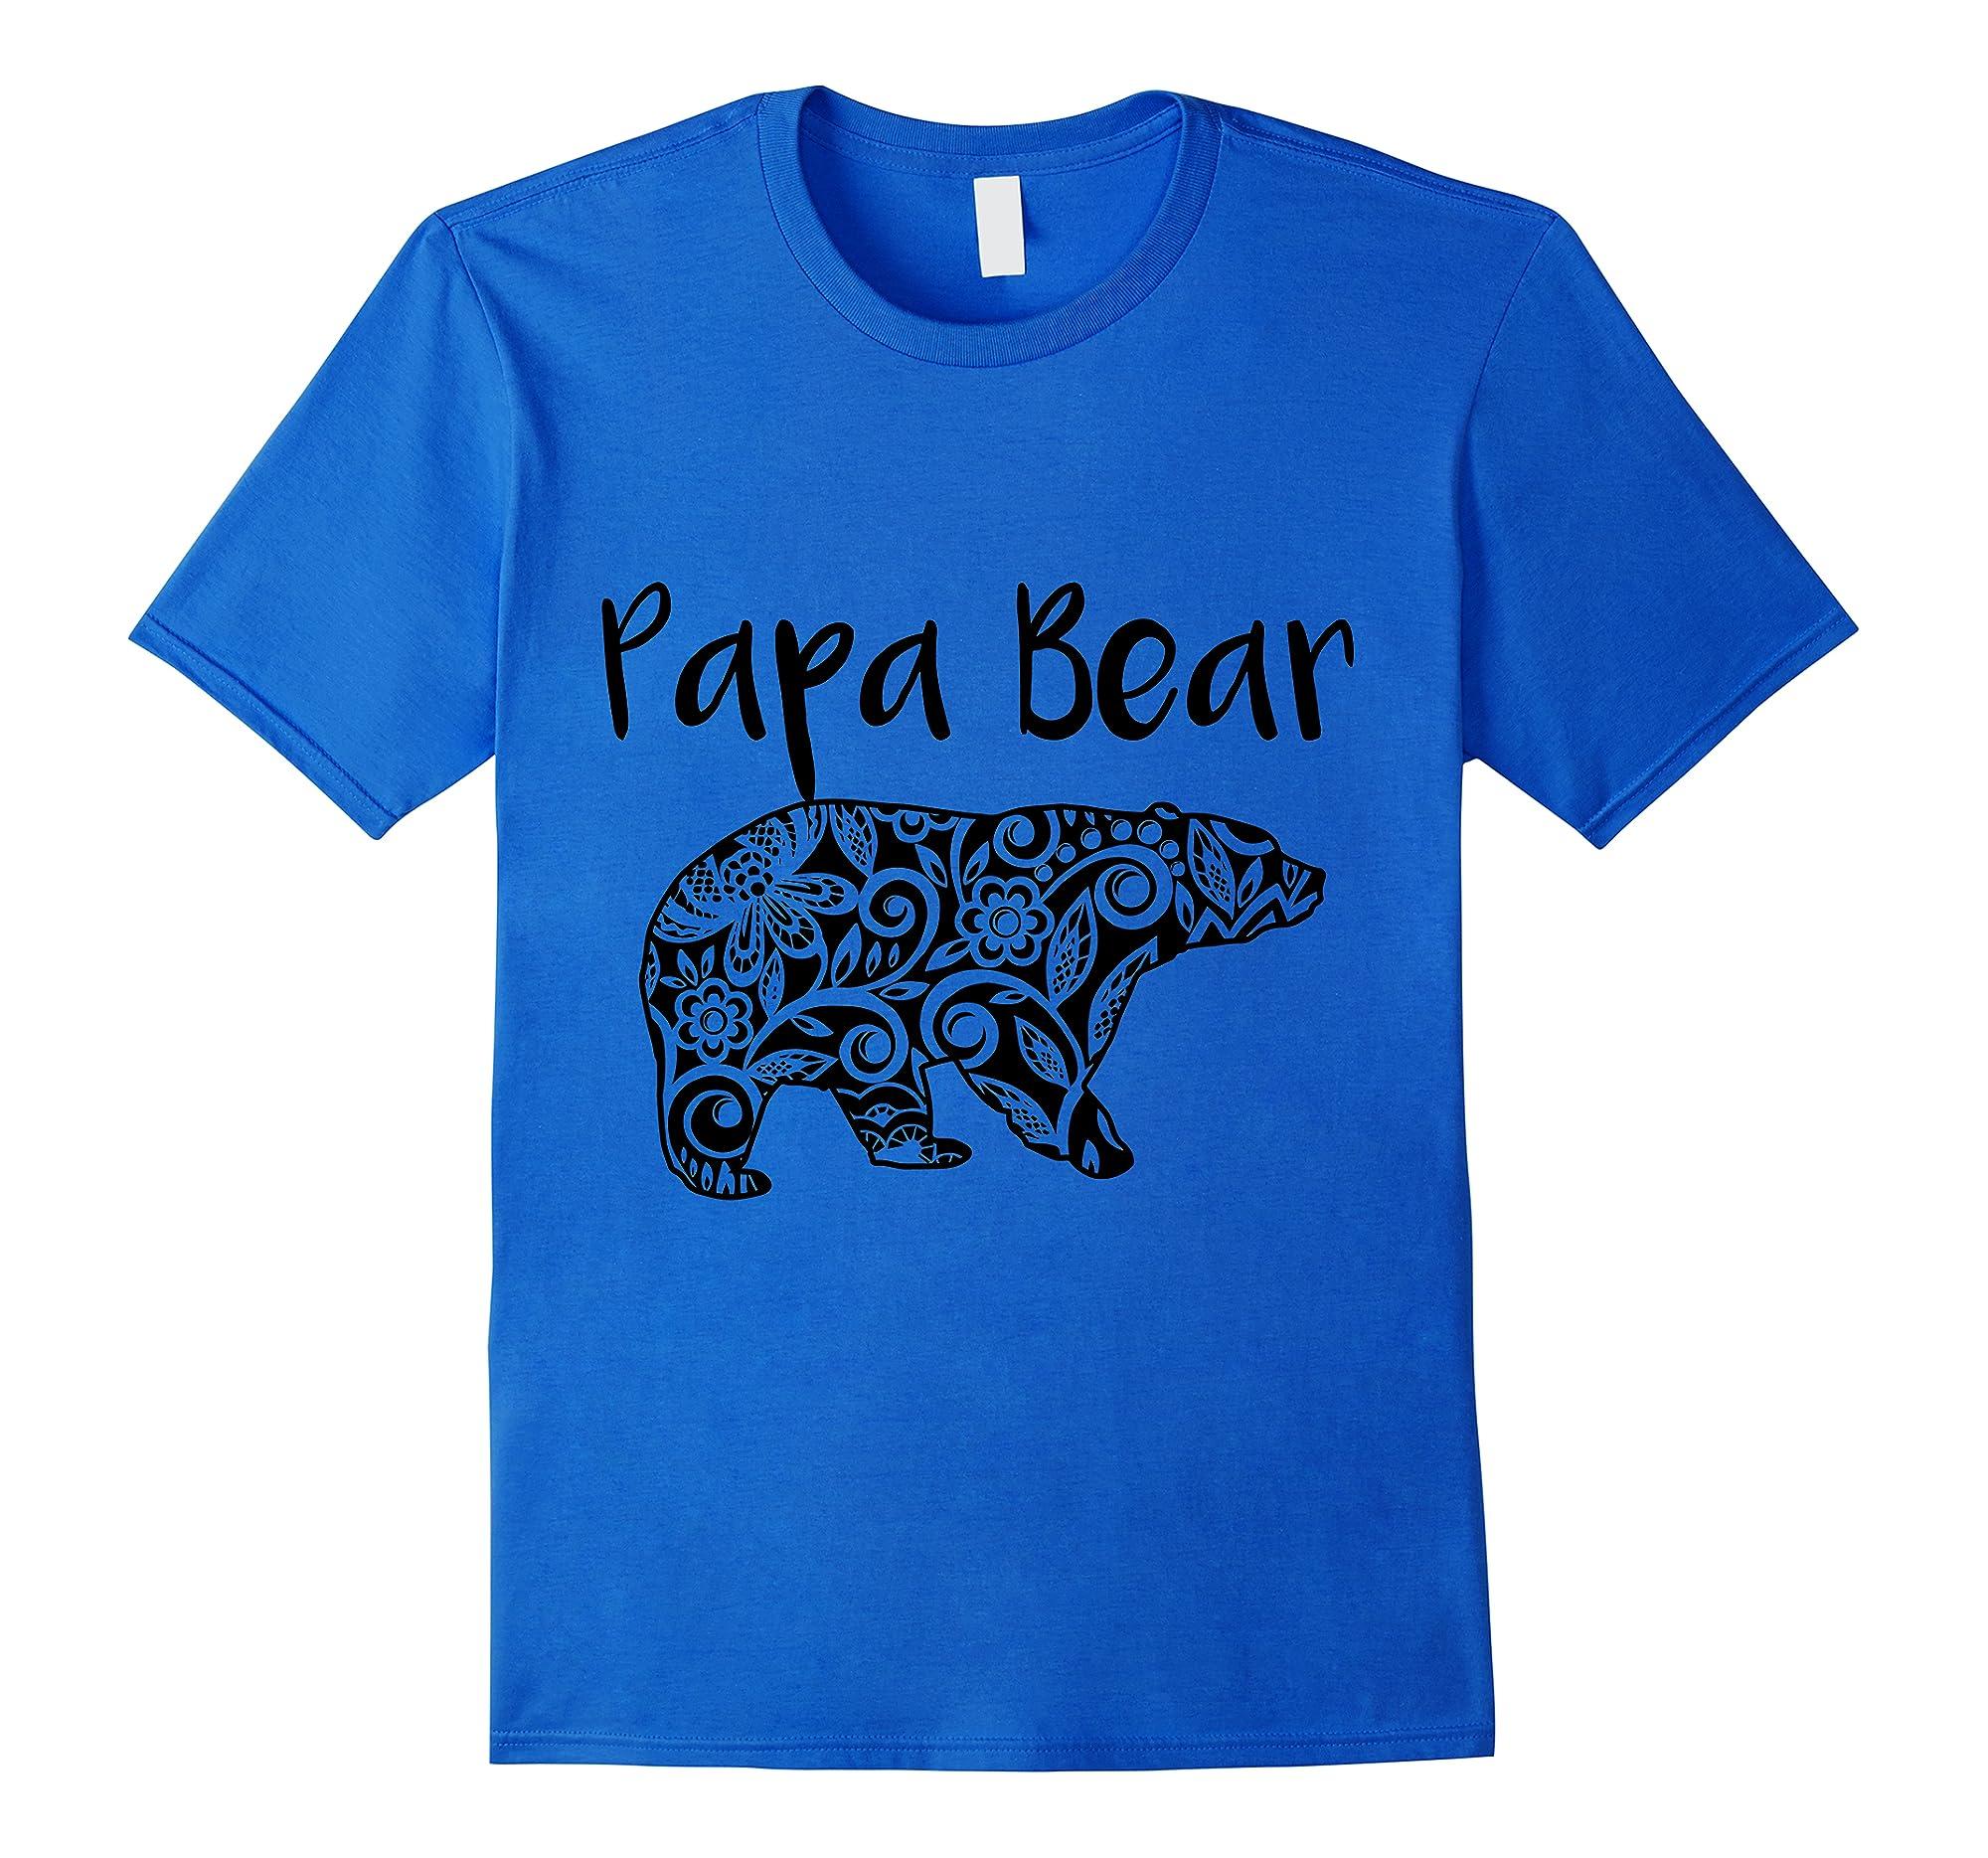 Fortuitous Dta Dta S Mama Papa Baby Bear Funny Family Matching Mother Day Ts Shirts Royal Blue